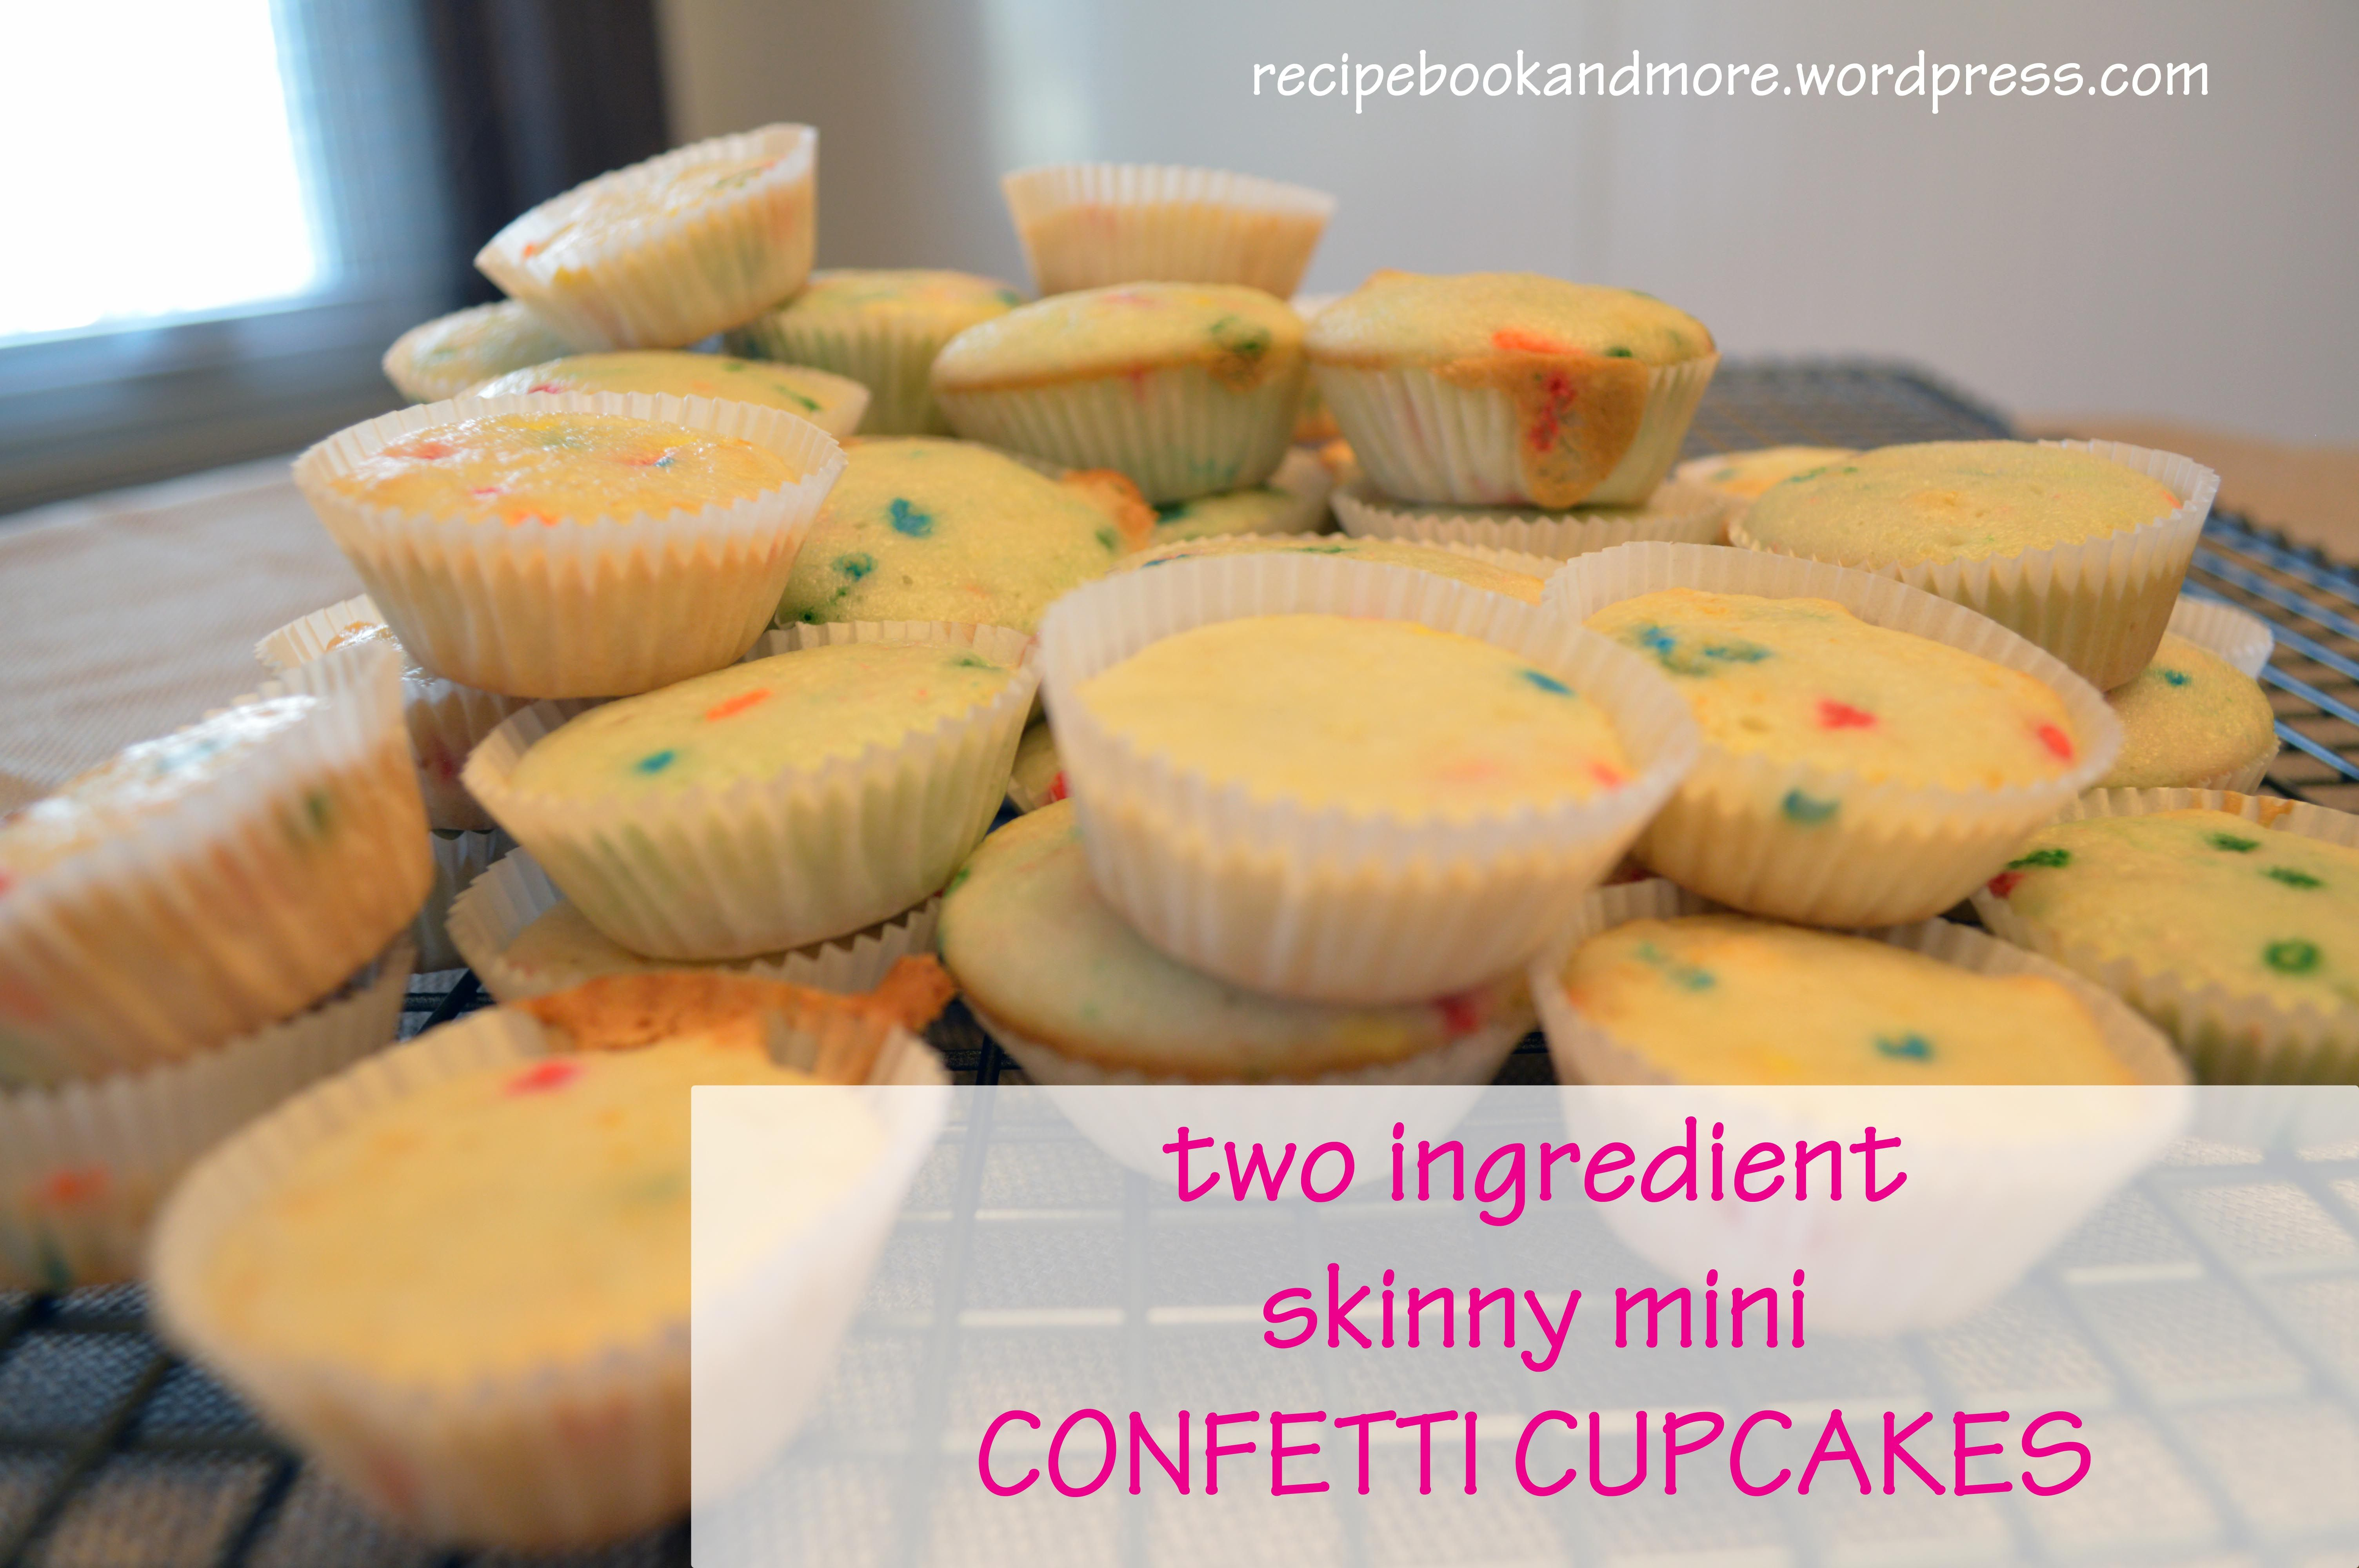 Skinny Mini Confetti Cupcakes With Images Soda Cupcakes Recipes